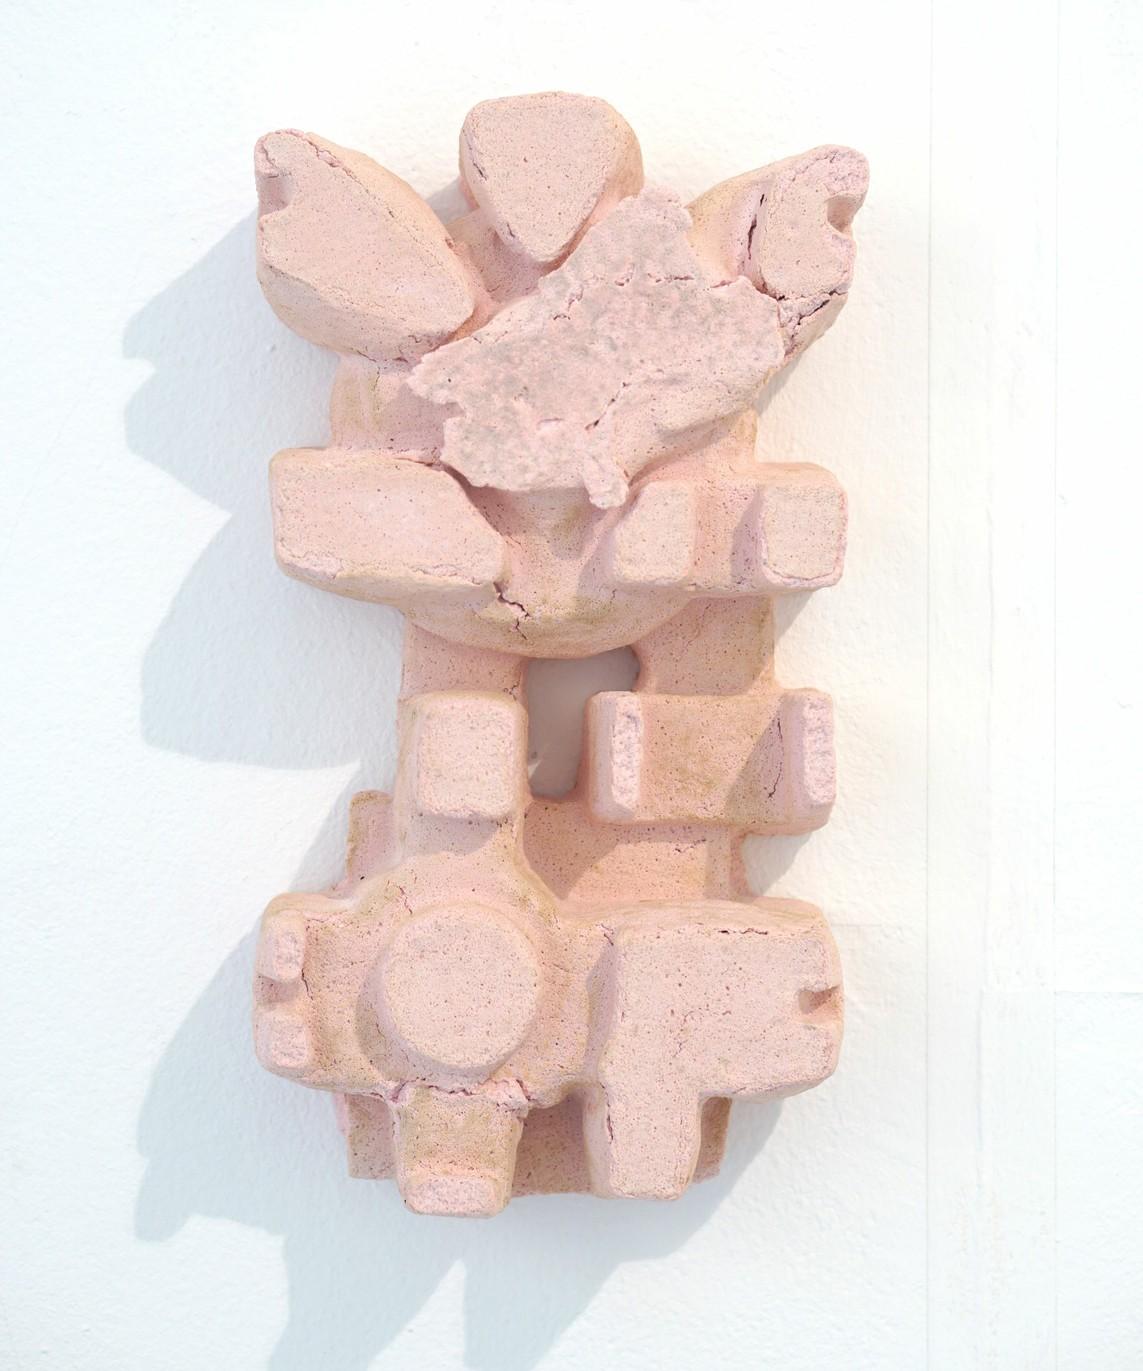 Umverpackung 34, 2018, Beton, Farbe, 17 x 31,5 x 7,5 cm